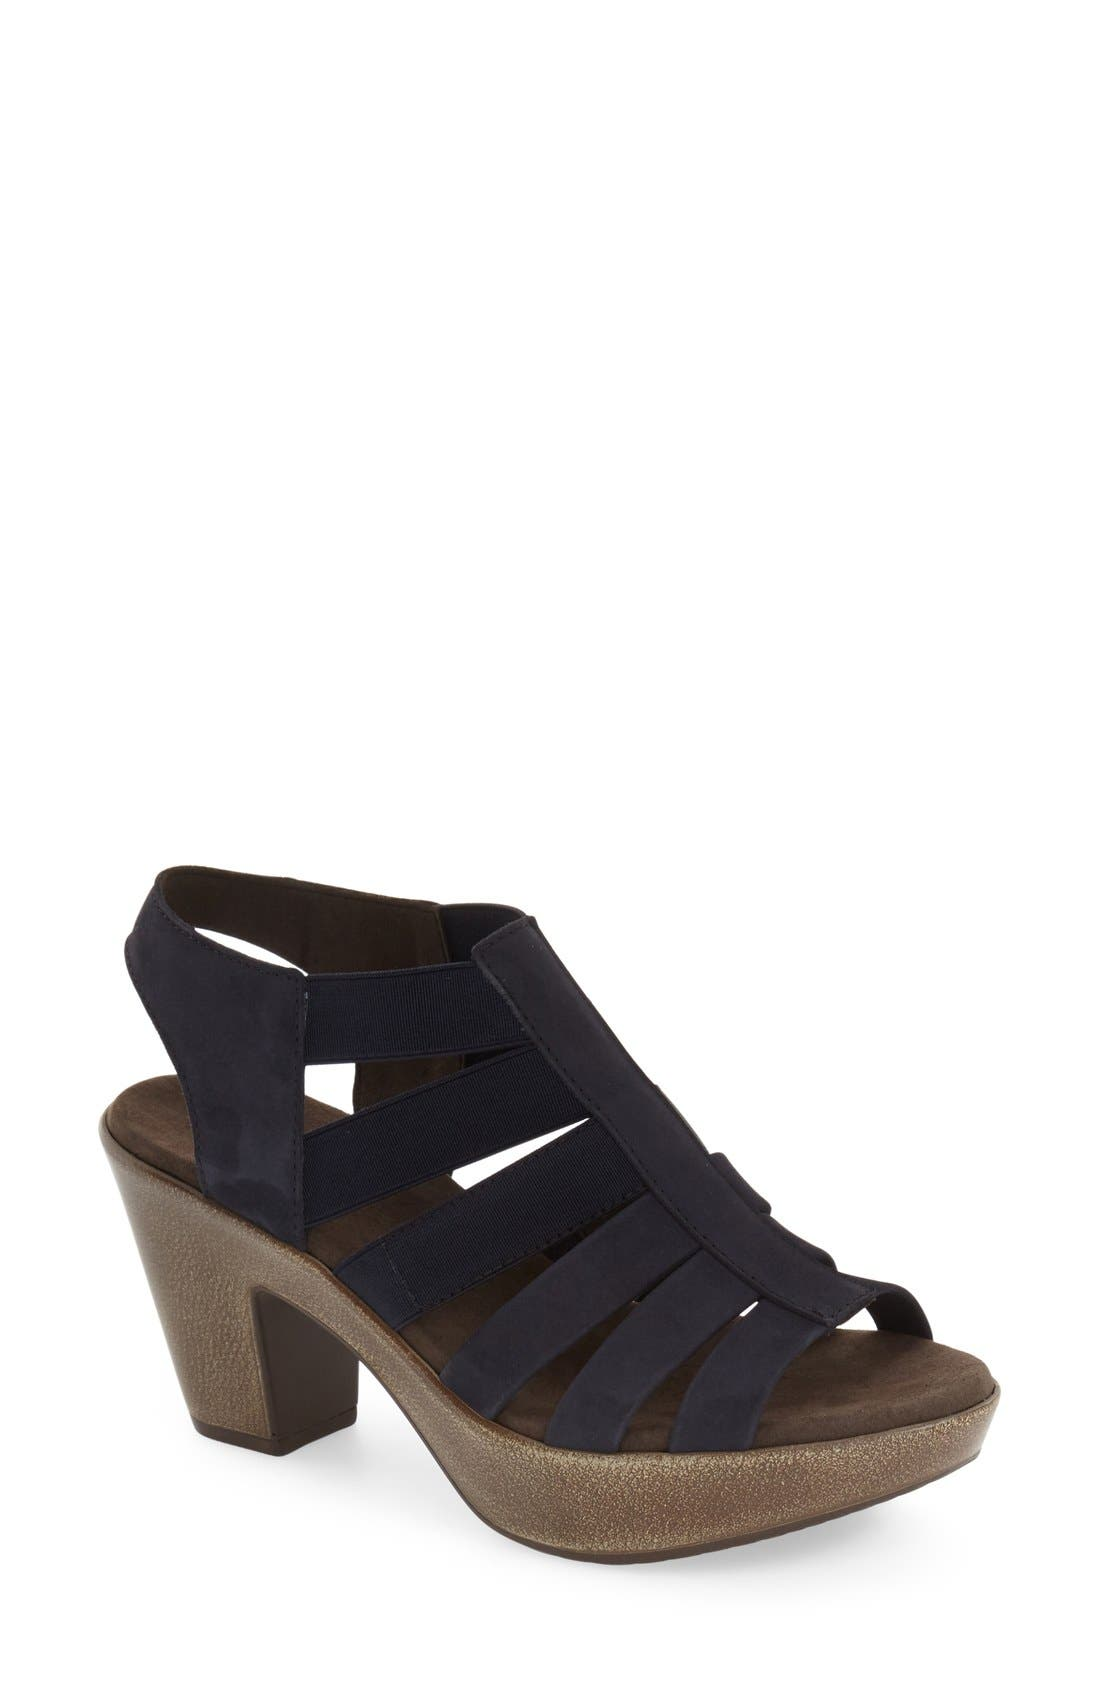 MUNRO 'Cookie' Slingback Sandal